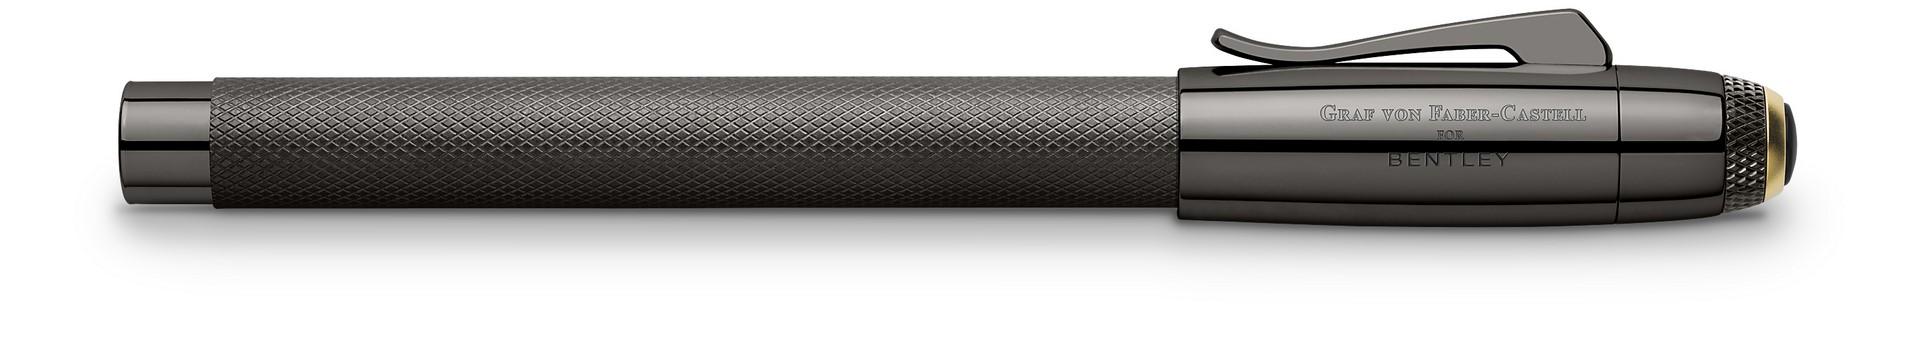 GvFC-Bentley-Centenary-Pen-4